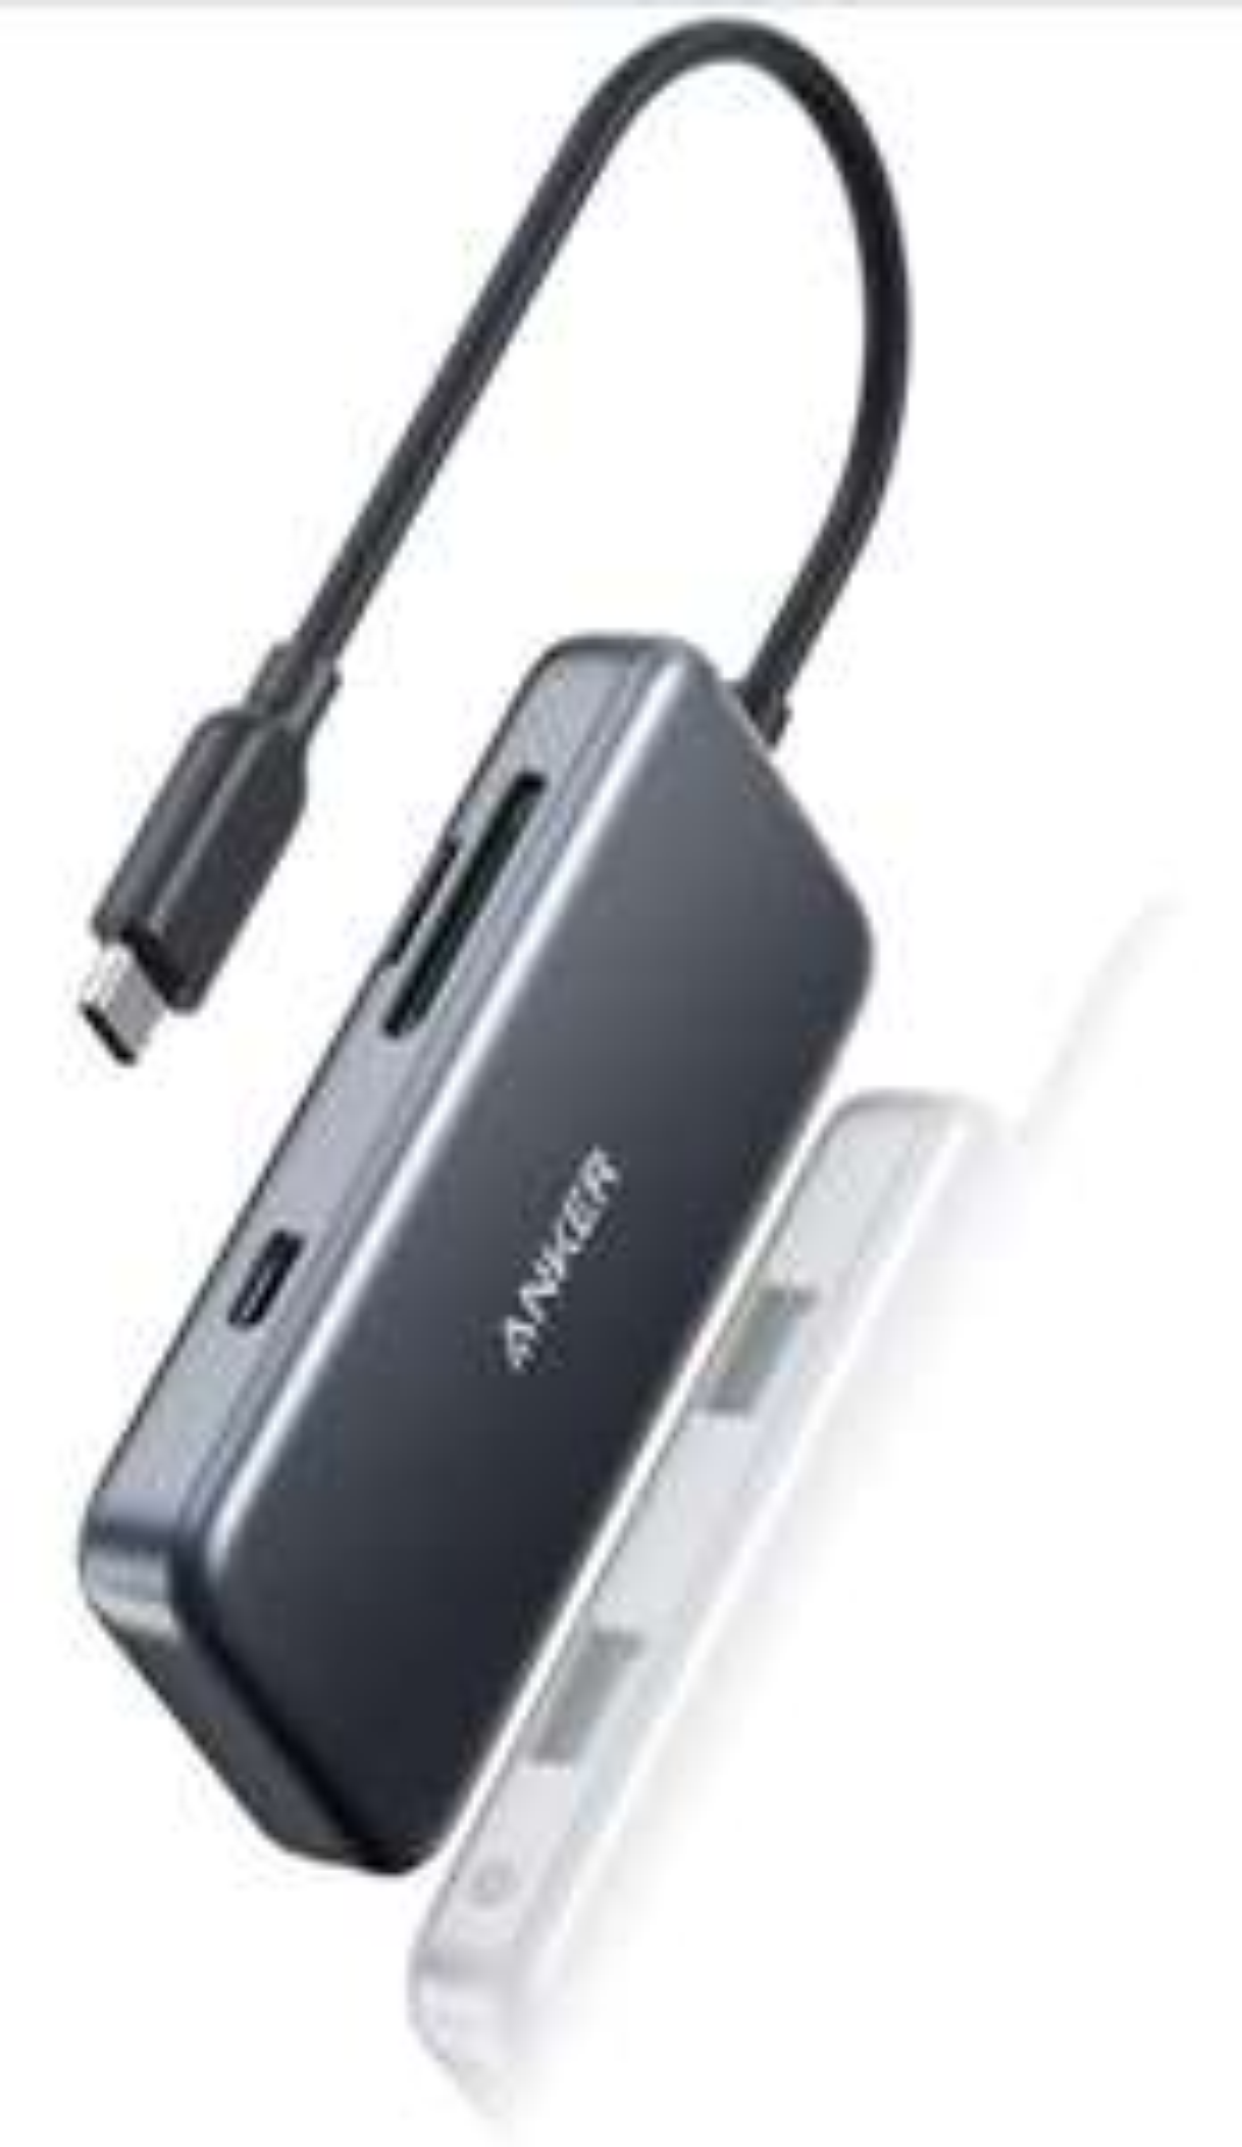 Anker 5-in-1 USB-C Hub, 60W Power Delivery Adapter, microSD / SD-Speicherkartenleser, 2 USB 3.0 Ports